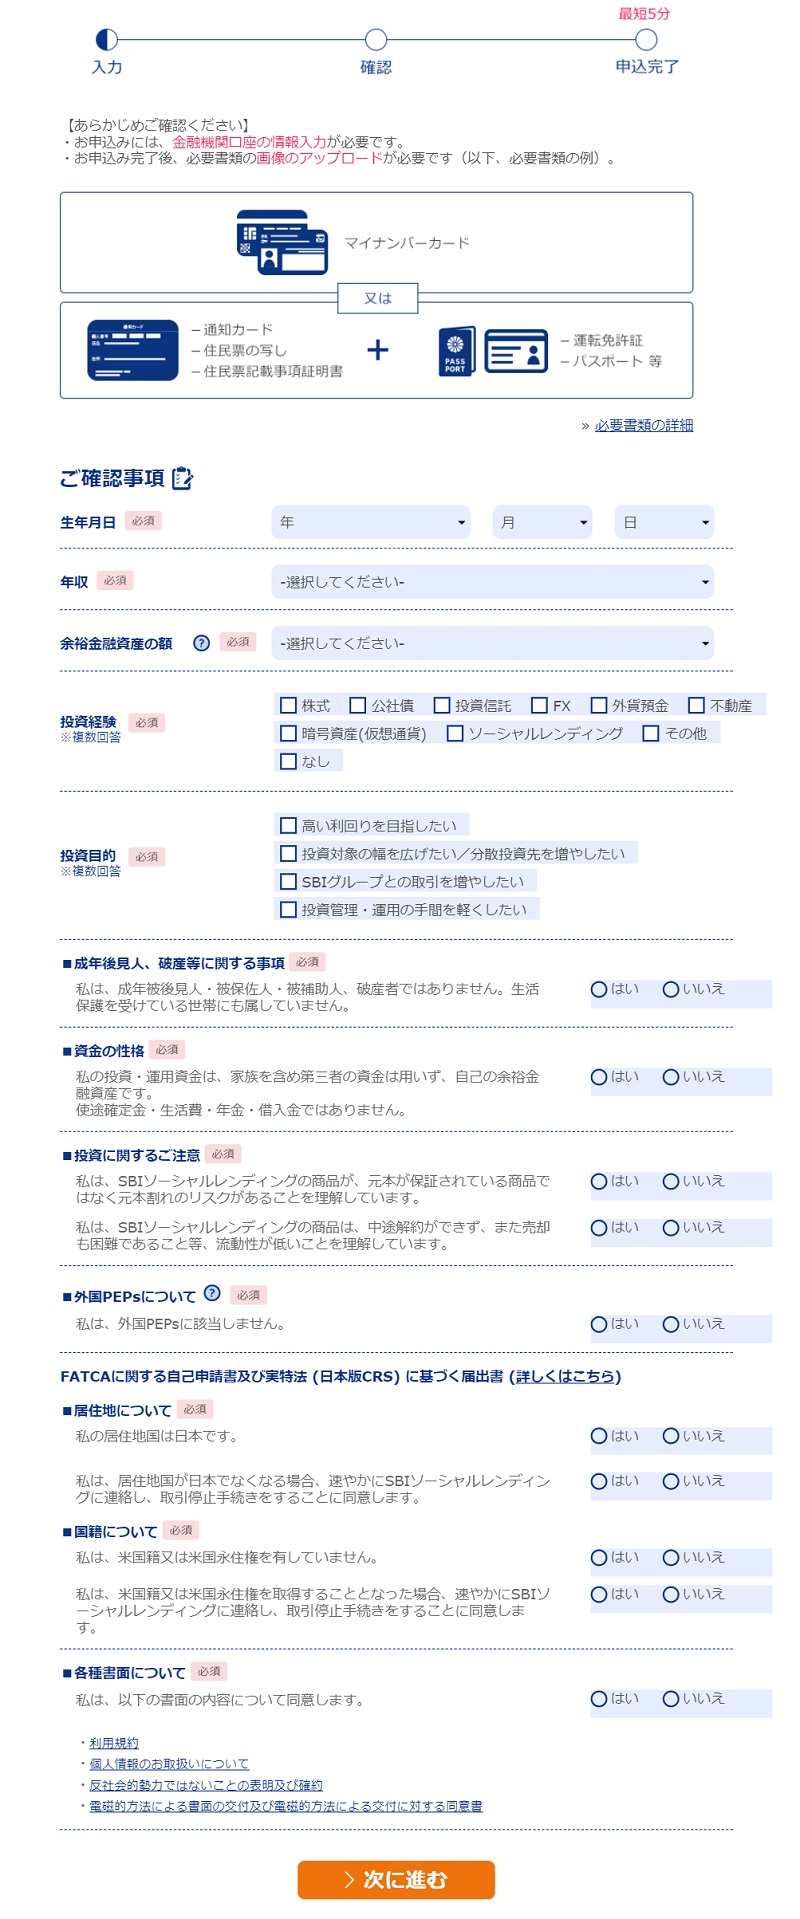 SBIソーシャルレンディング投資家登録Step3【生年月日・年収等の入力】